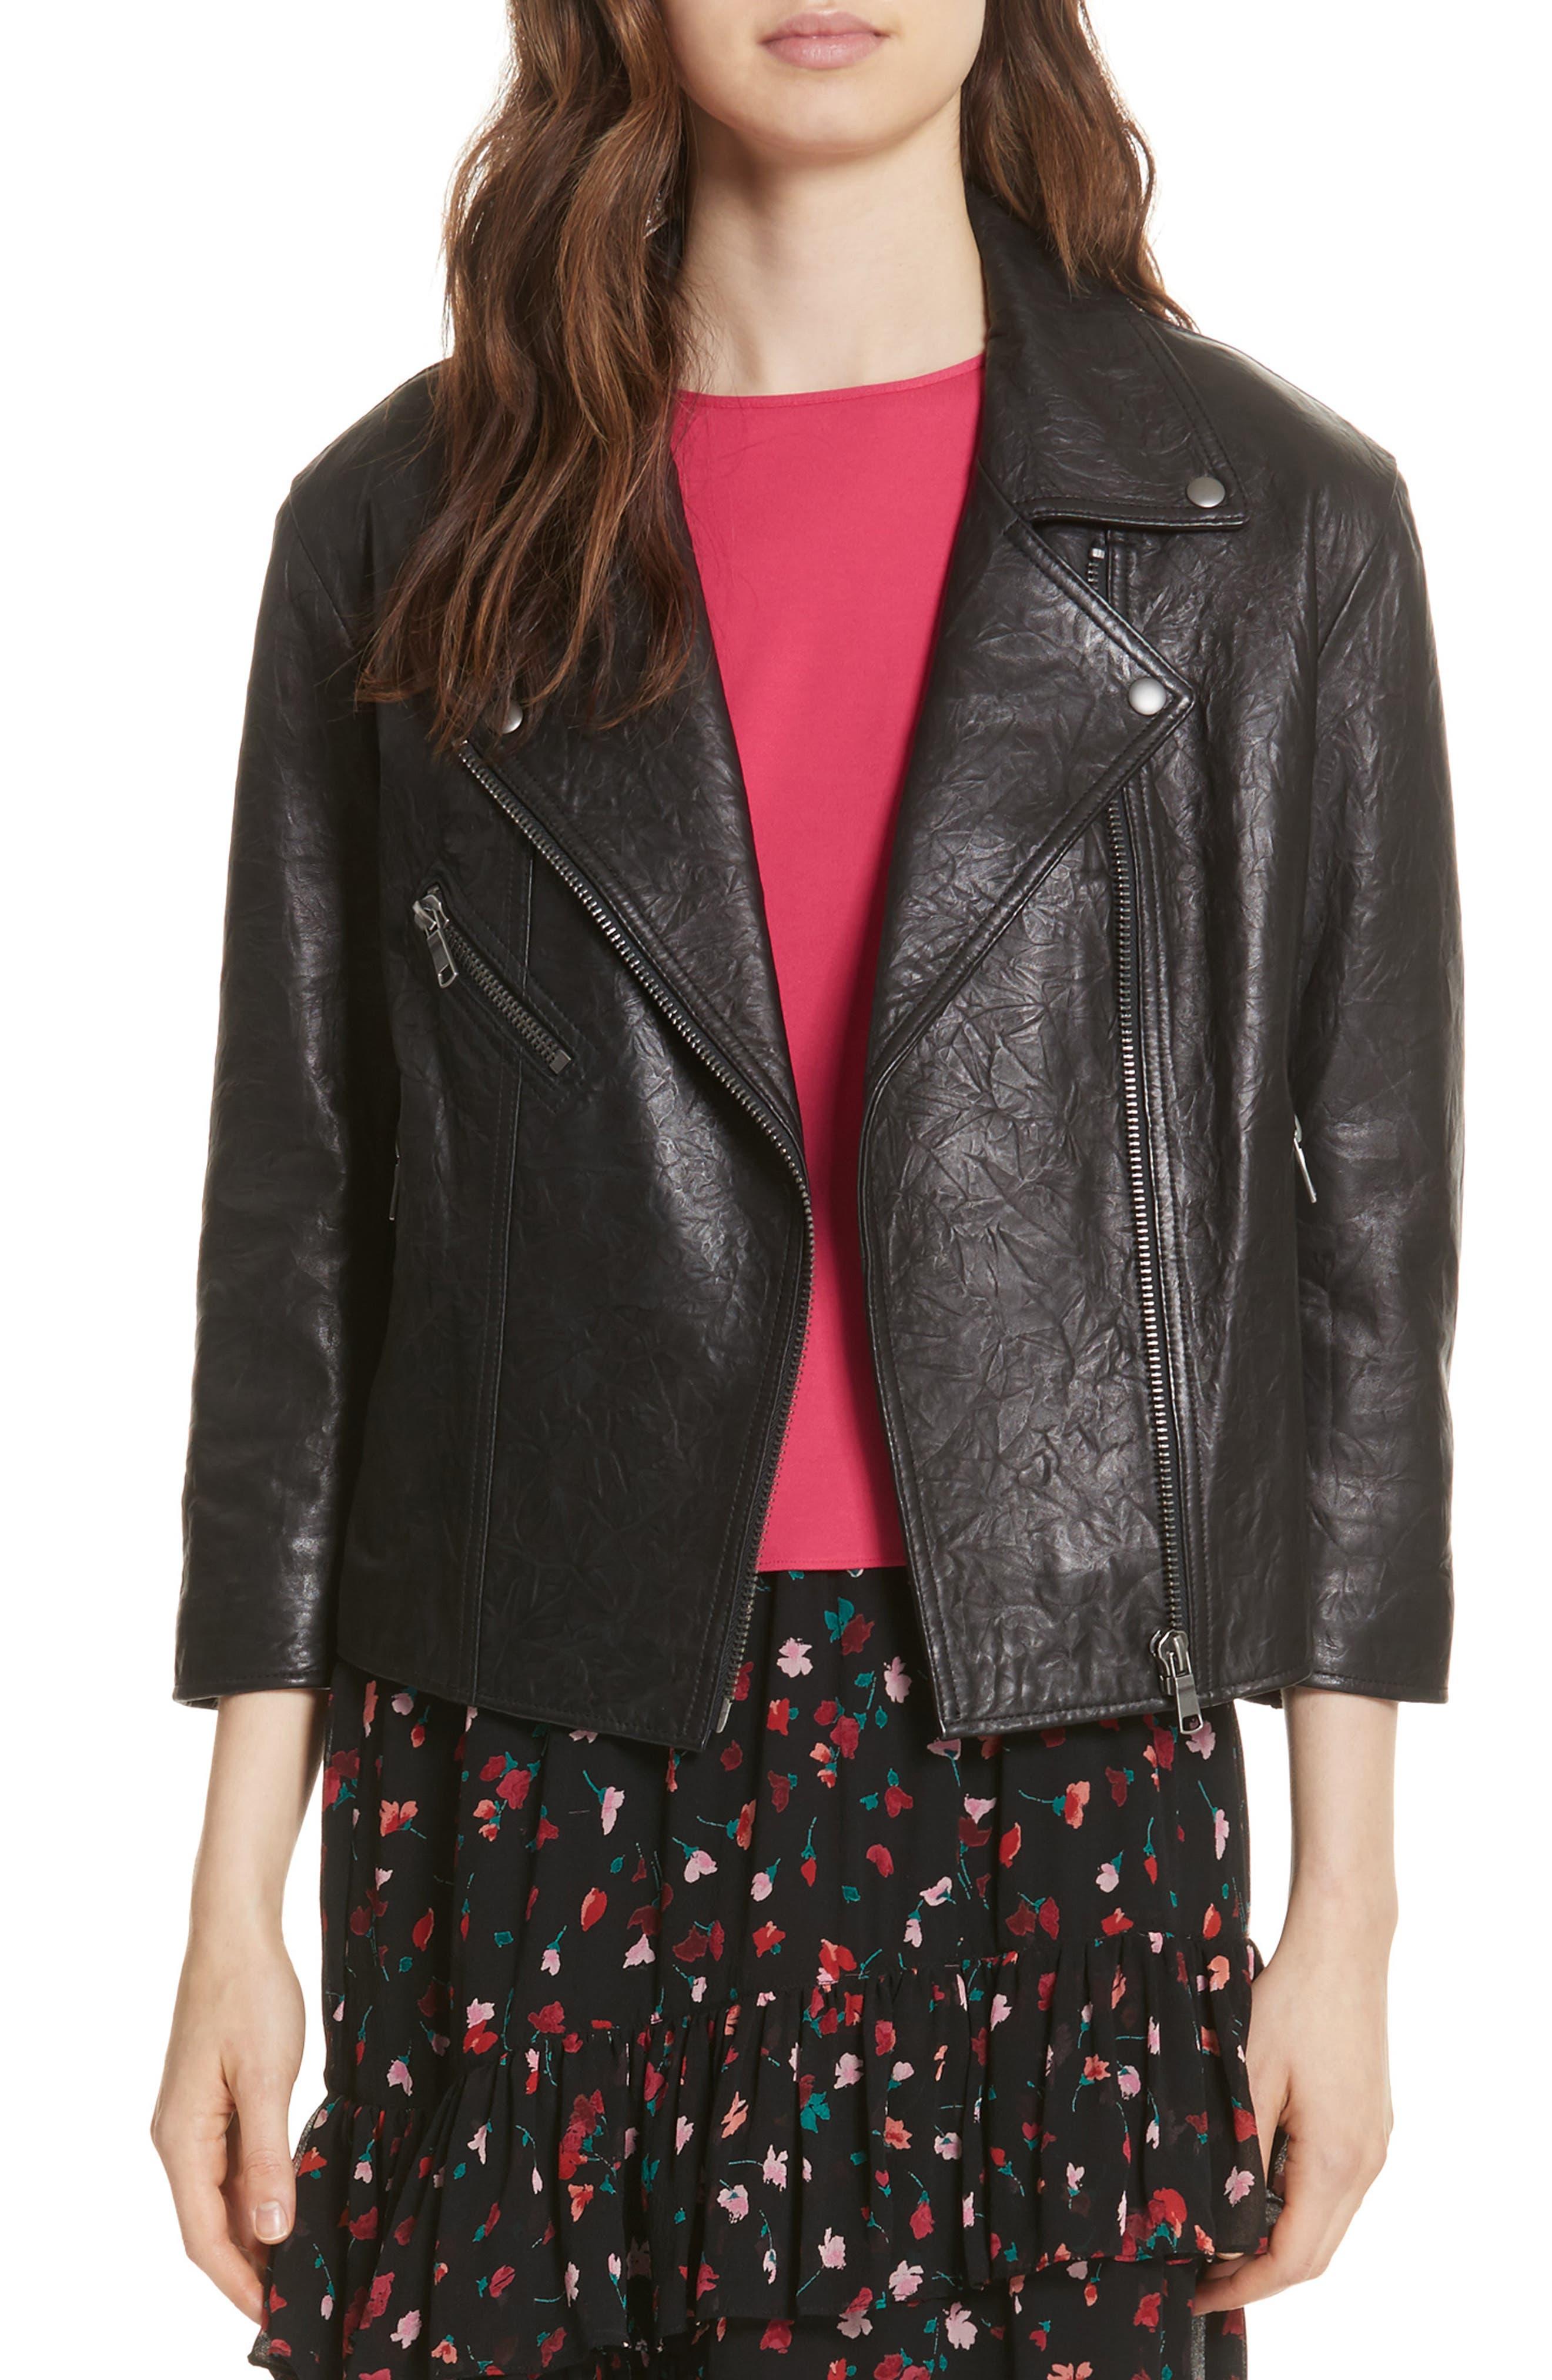 Kameke Viva La Femme Lambskin Leather Jacket,                             Main thumbnail 1, color,                             Caviar